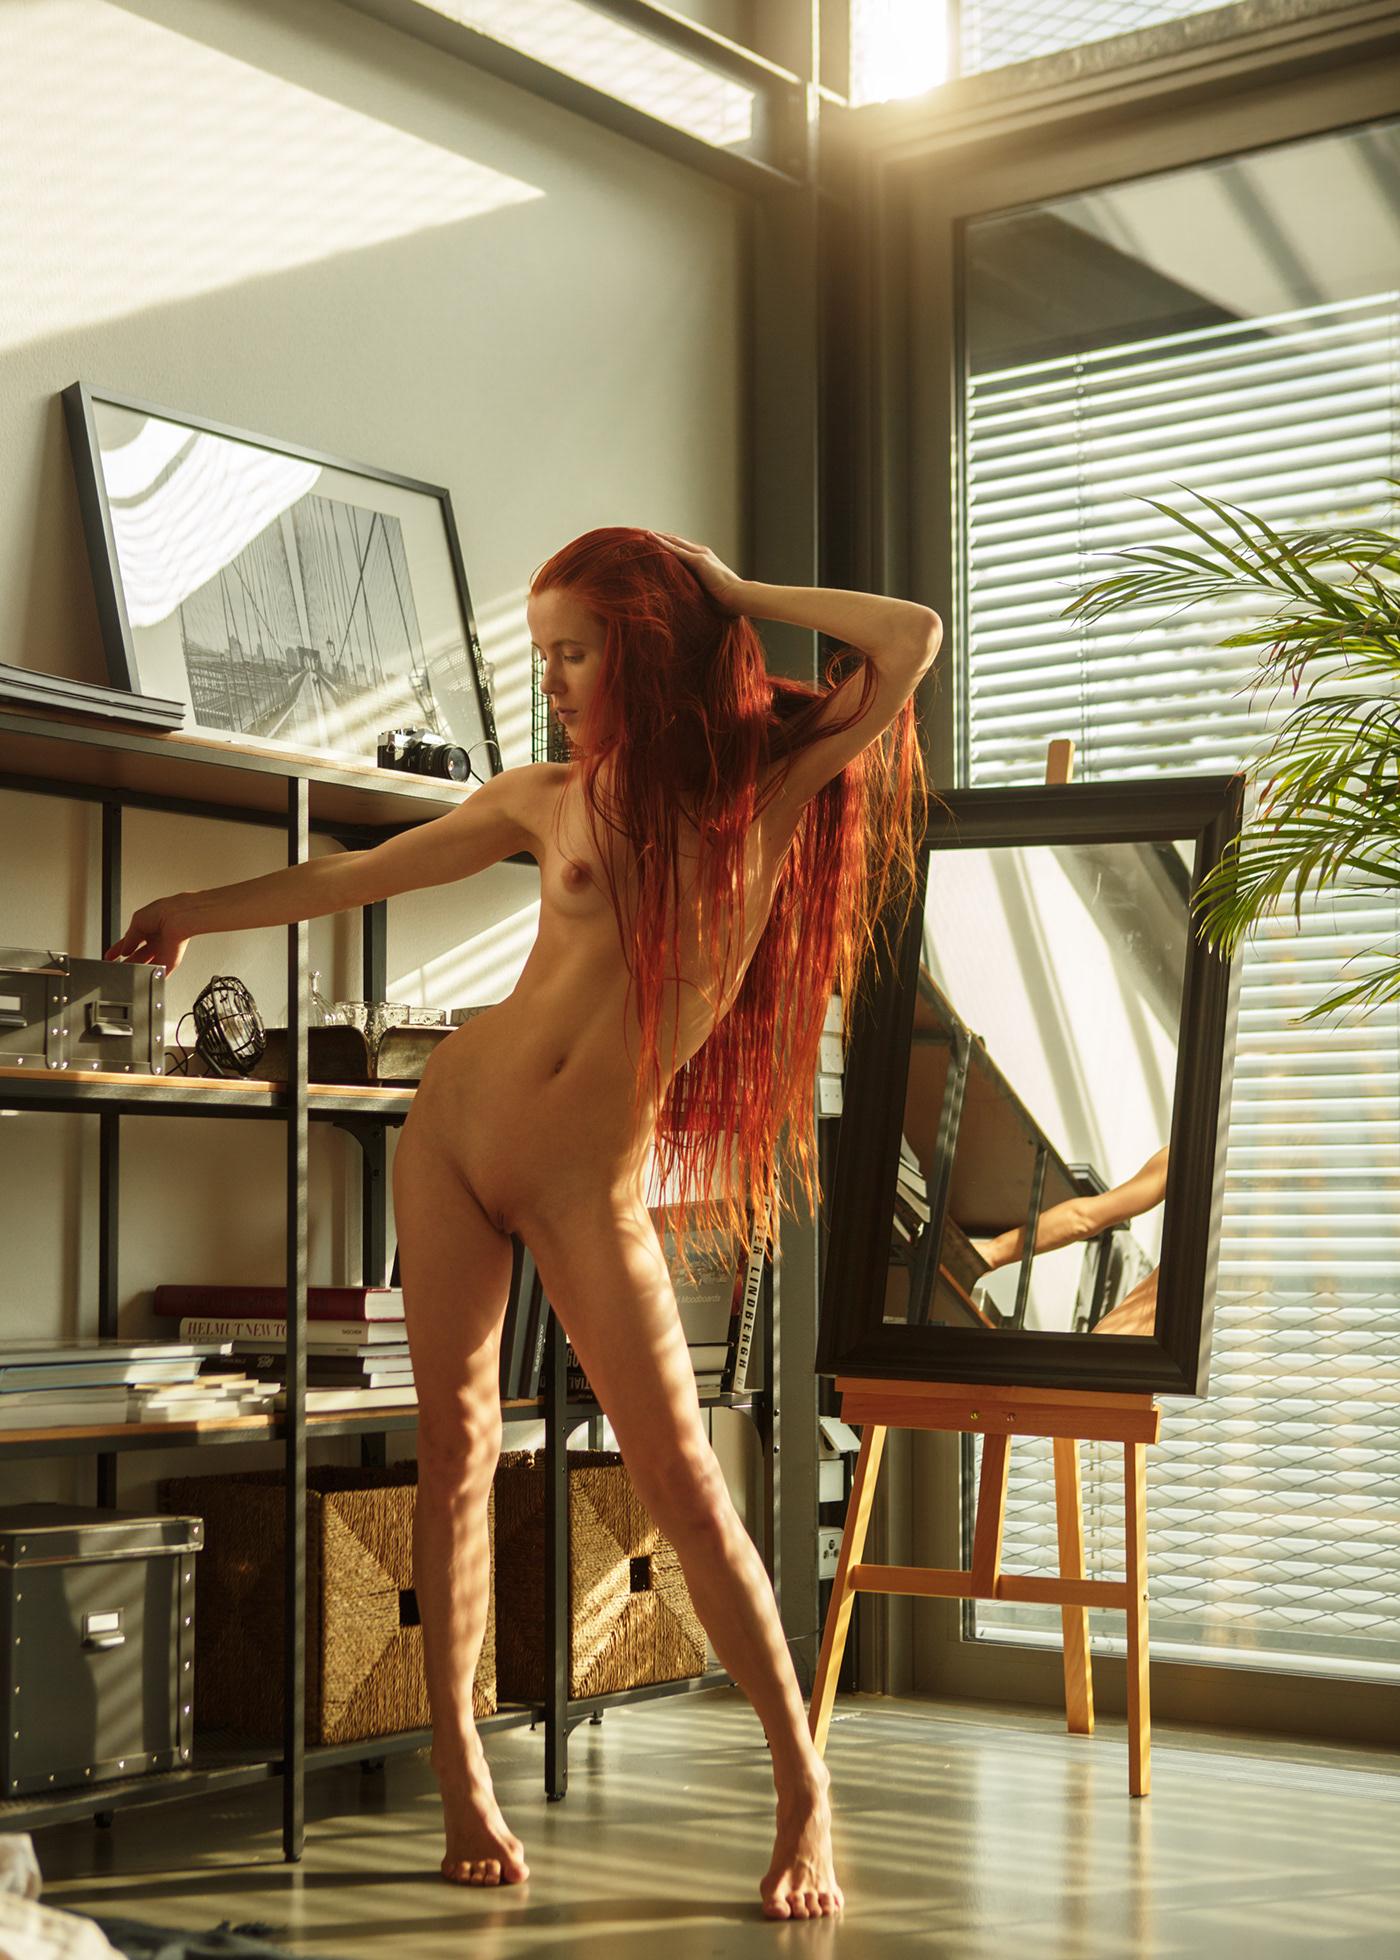 On a Friday afternoon / фотограф Hannes Walendy